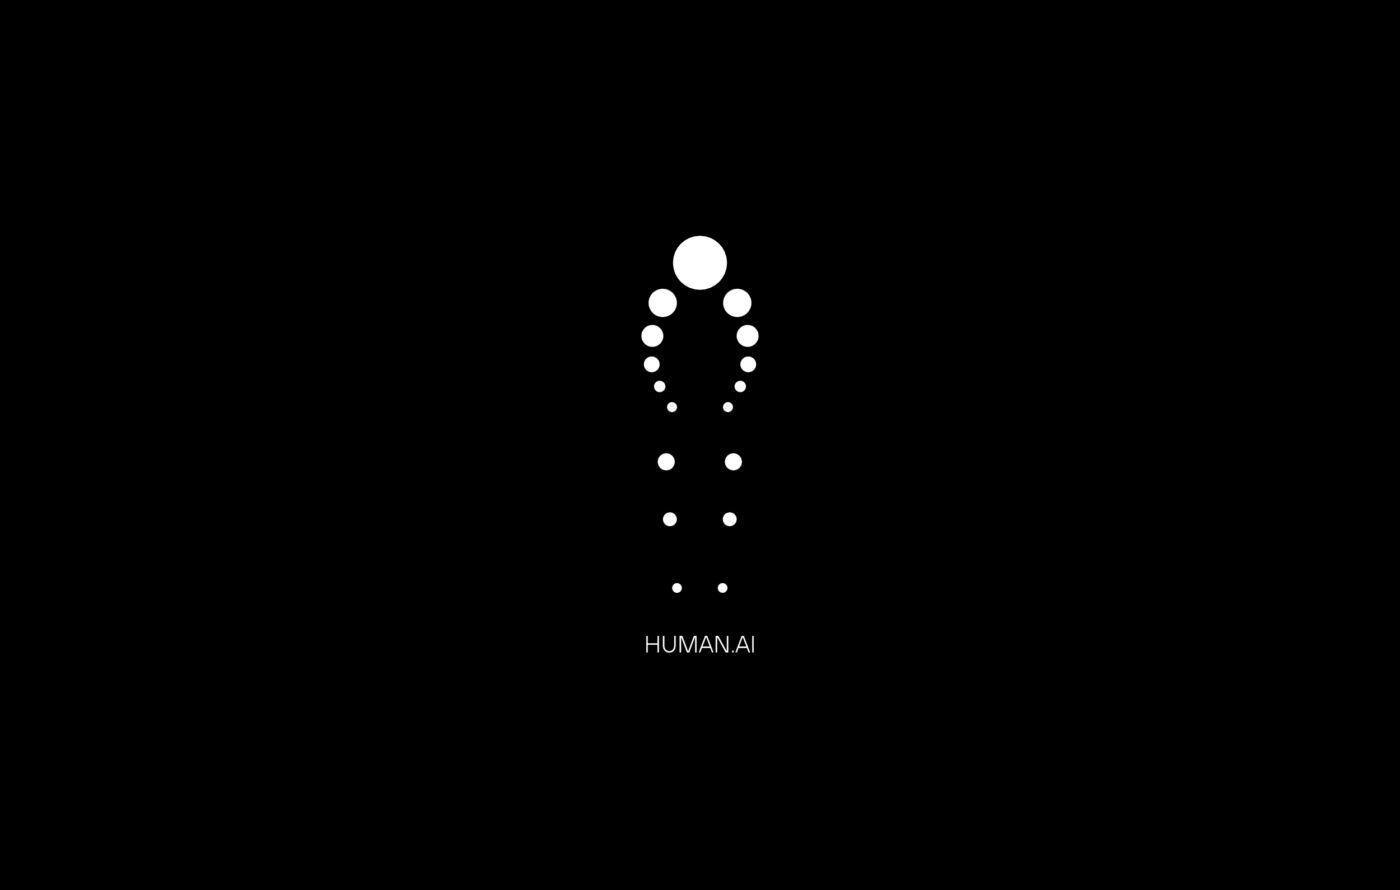 Human AI Logo Design Black